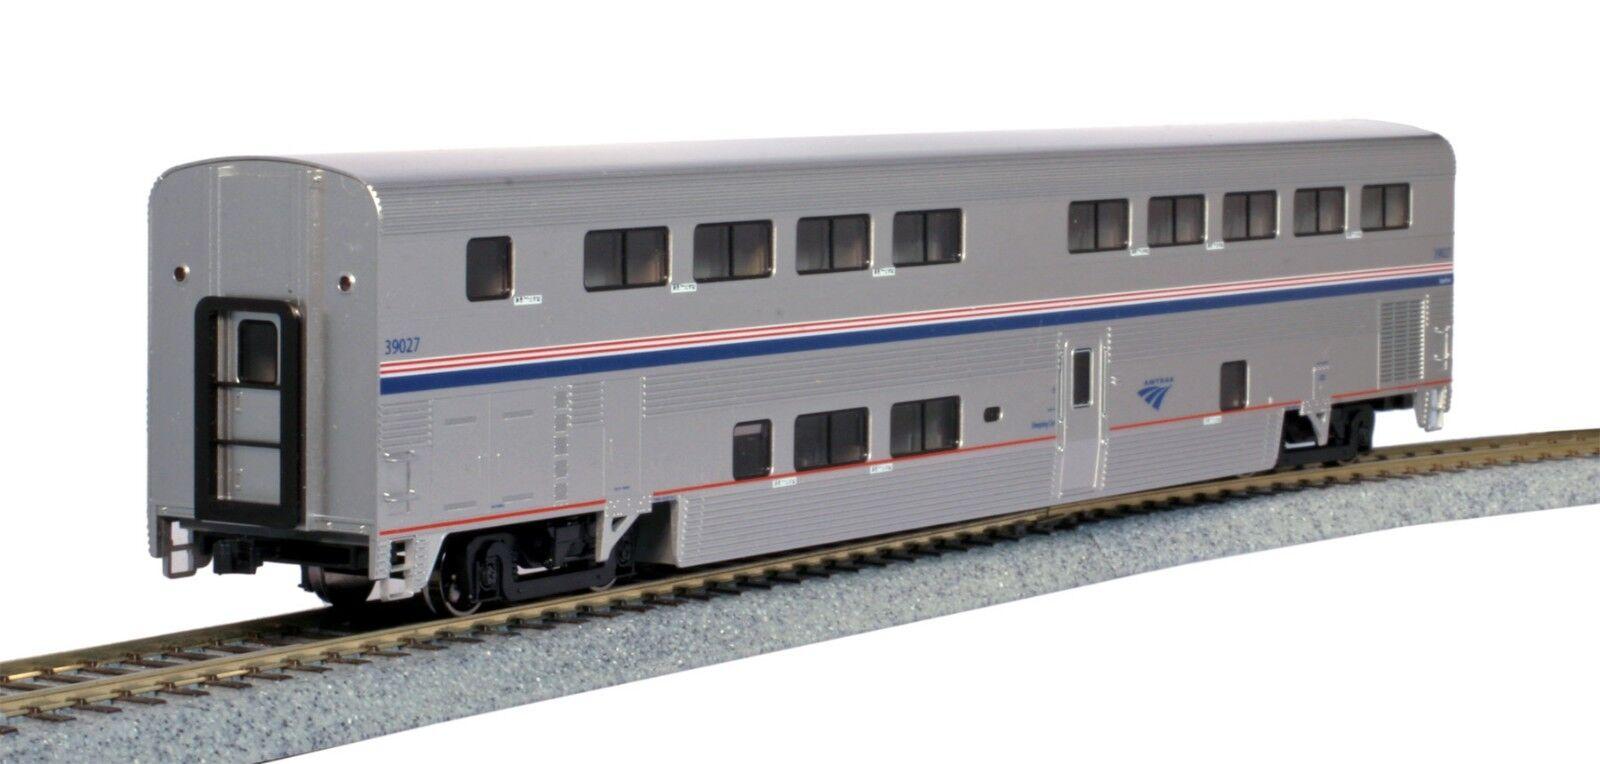 HO Amtrak Superliner II Transition Sleeper Phase IVb  39027  KATO  356251